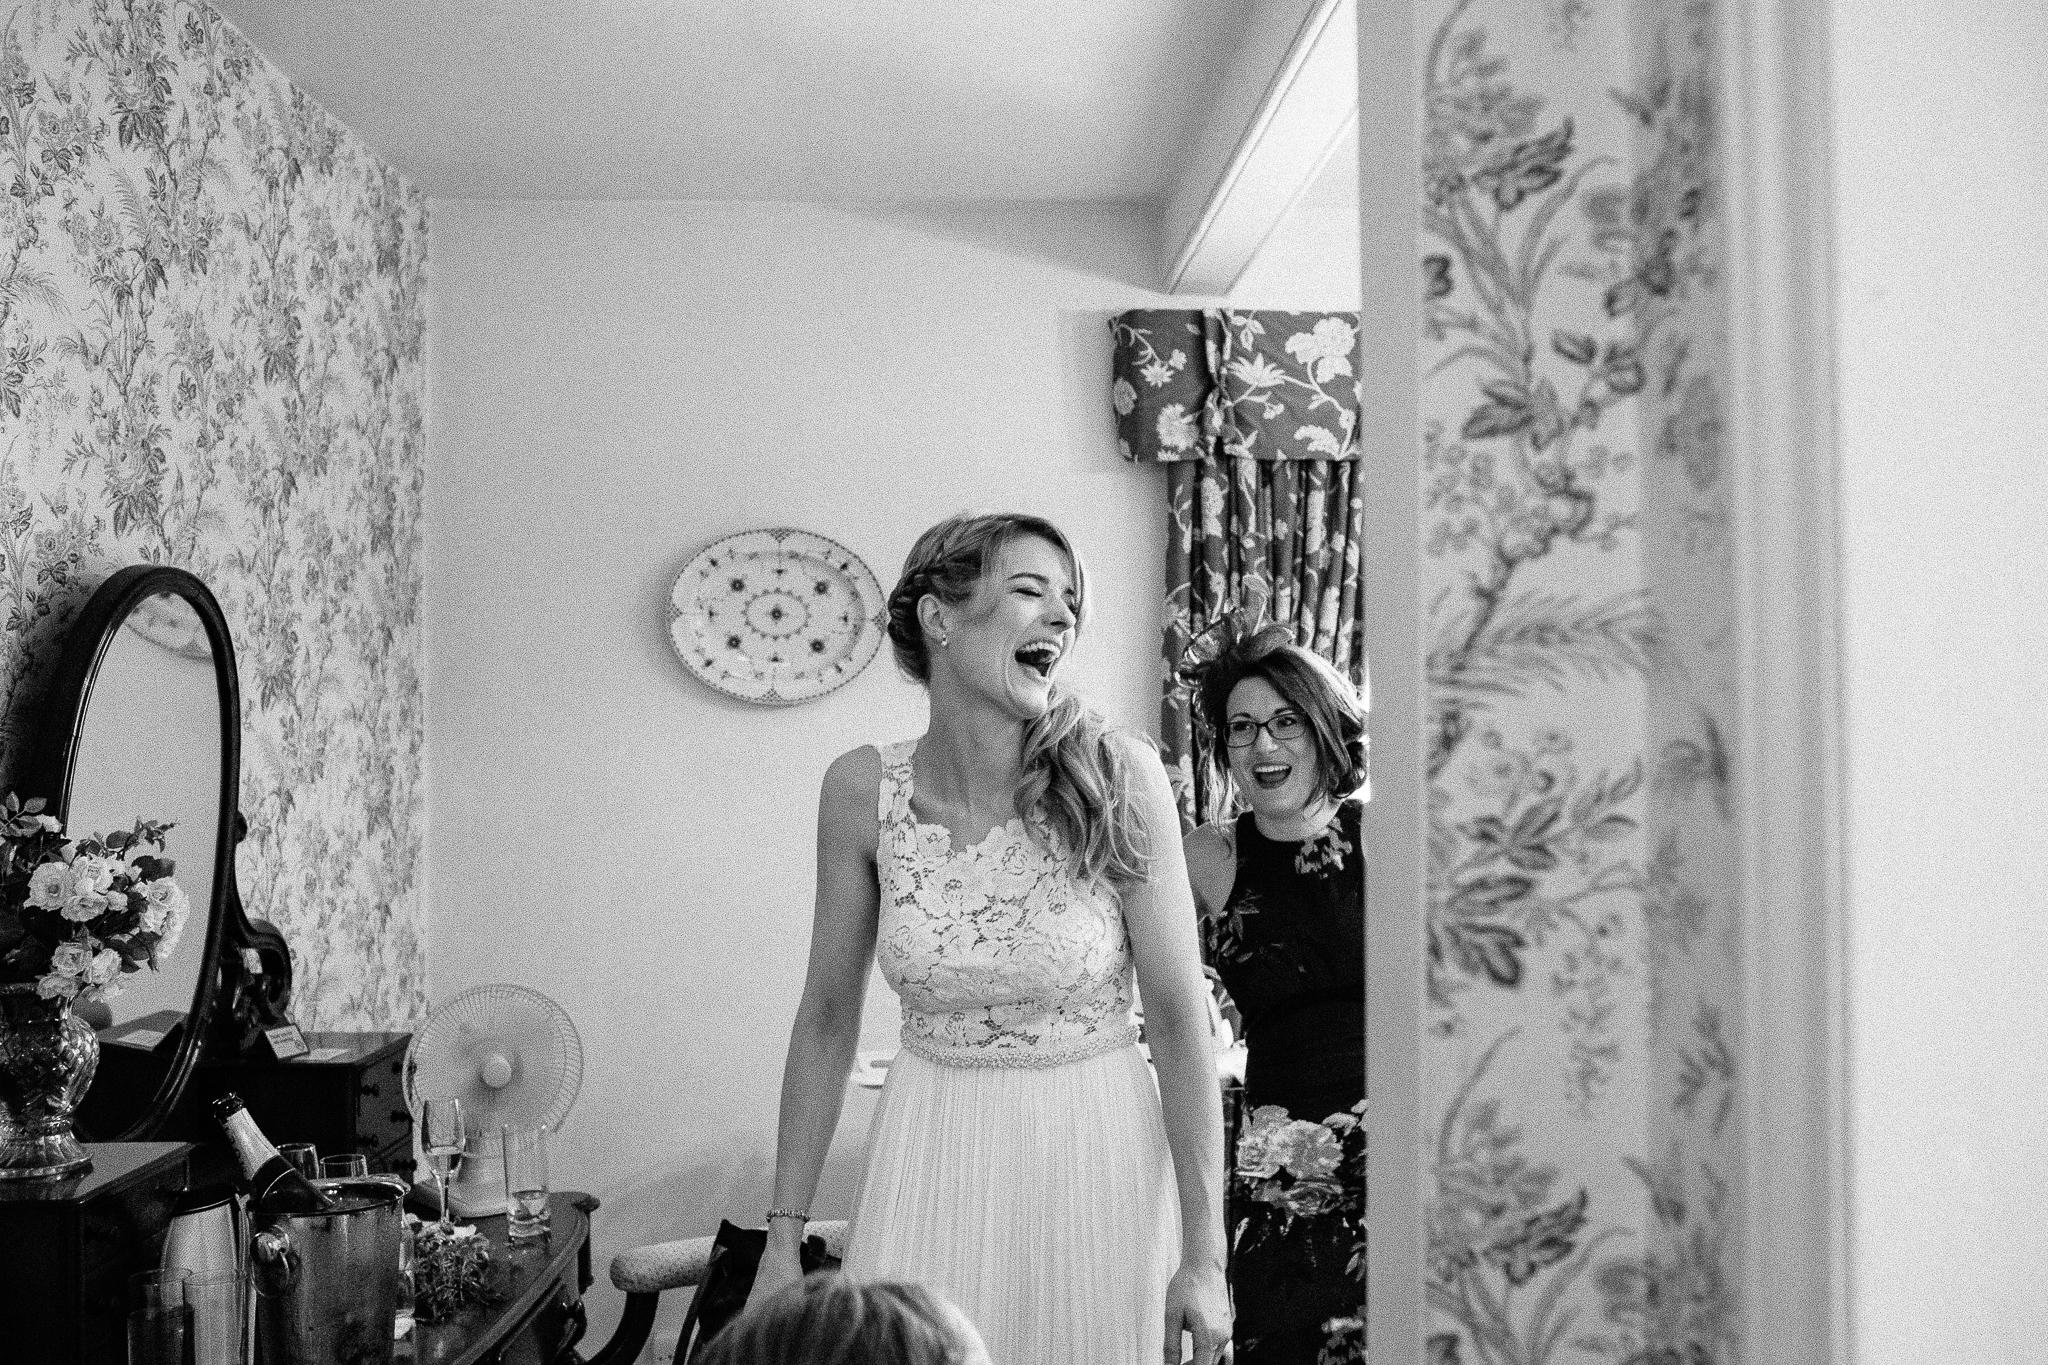 grantham_wedding_photographer-40.jpg